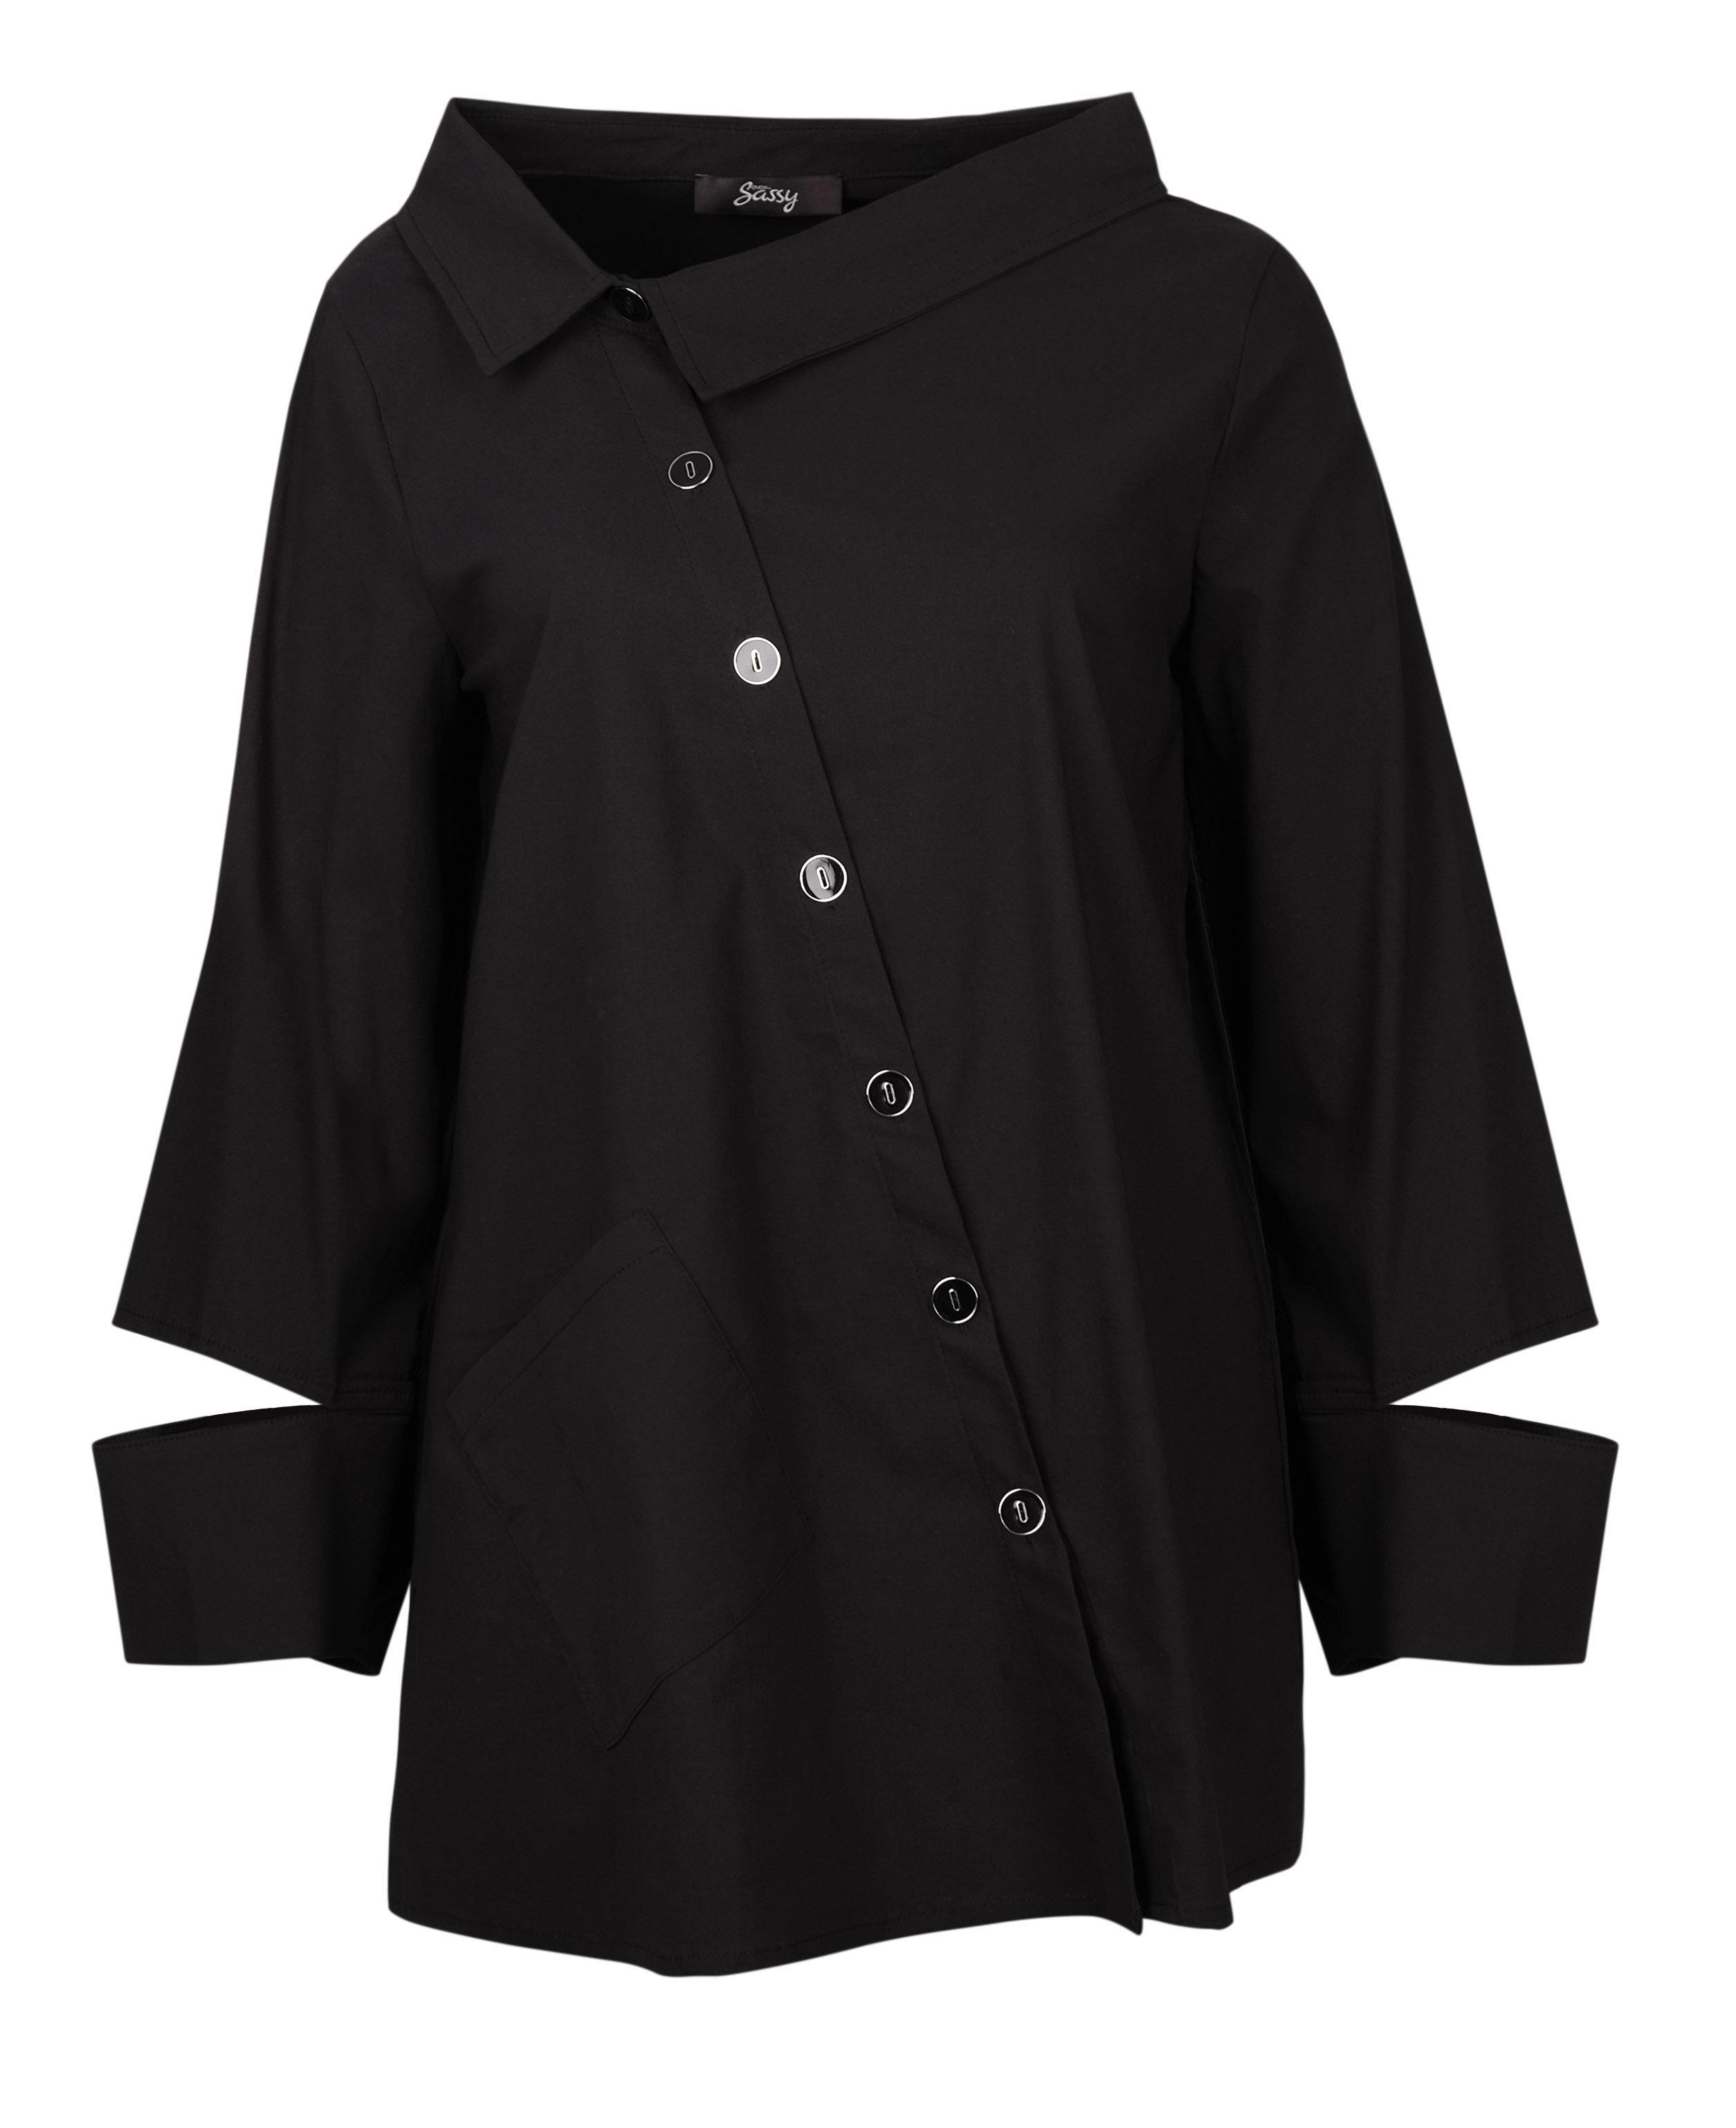 EverSassy: Asymmetrical Split Sleeve Tunic/Jacket EverSassy_61137